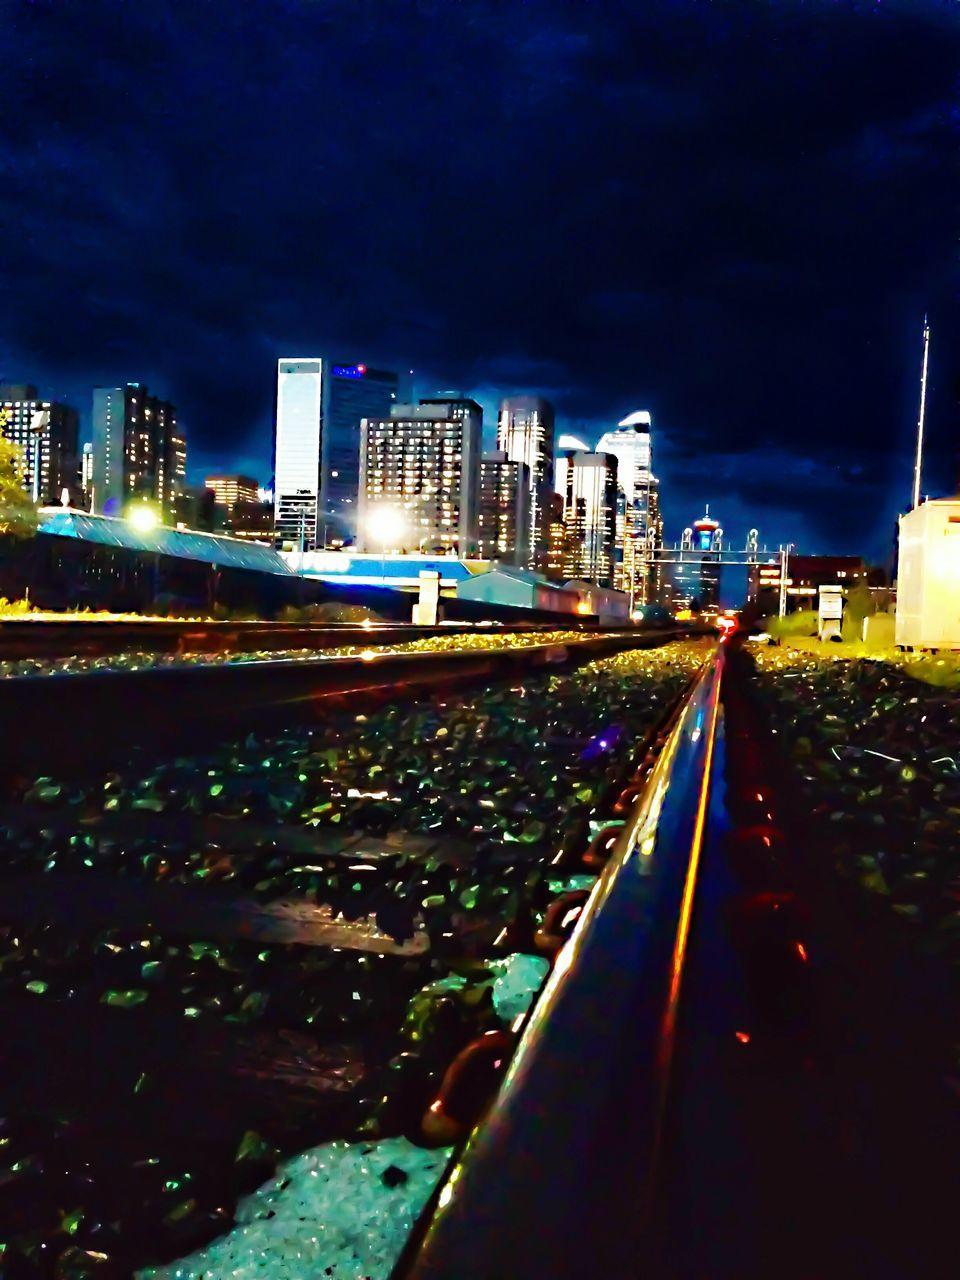 illuminated, night, architecture, building exterior, built structure, city, skyscraper, cityscape, city life, outdoors, transportation, no people, modern, travel destinations, sky, urban skyline